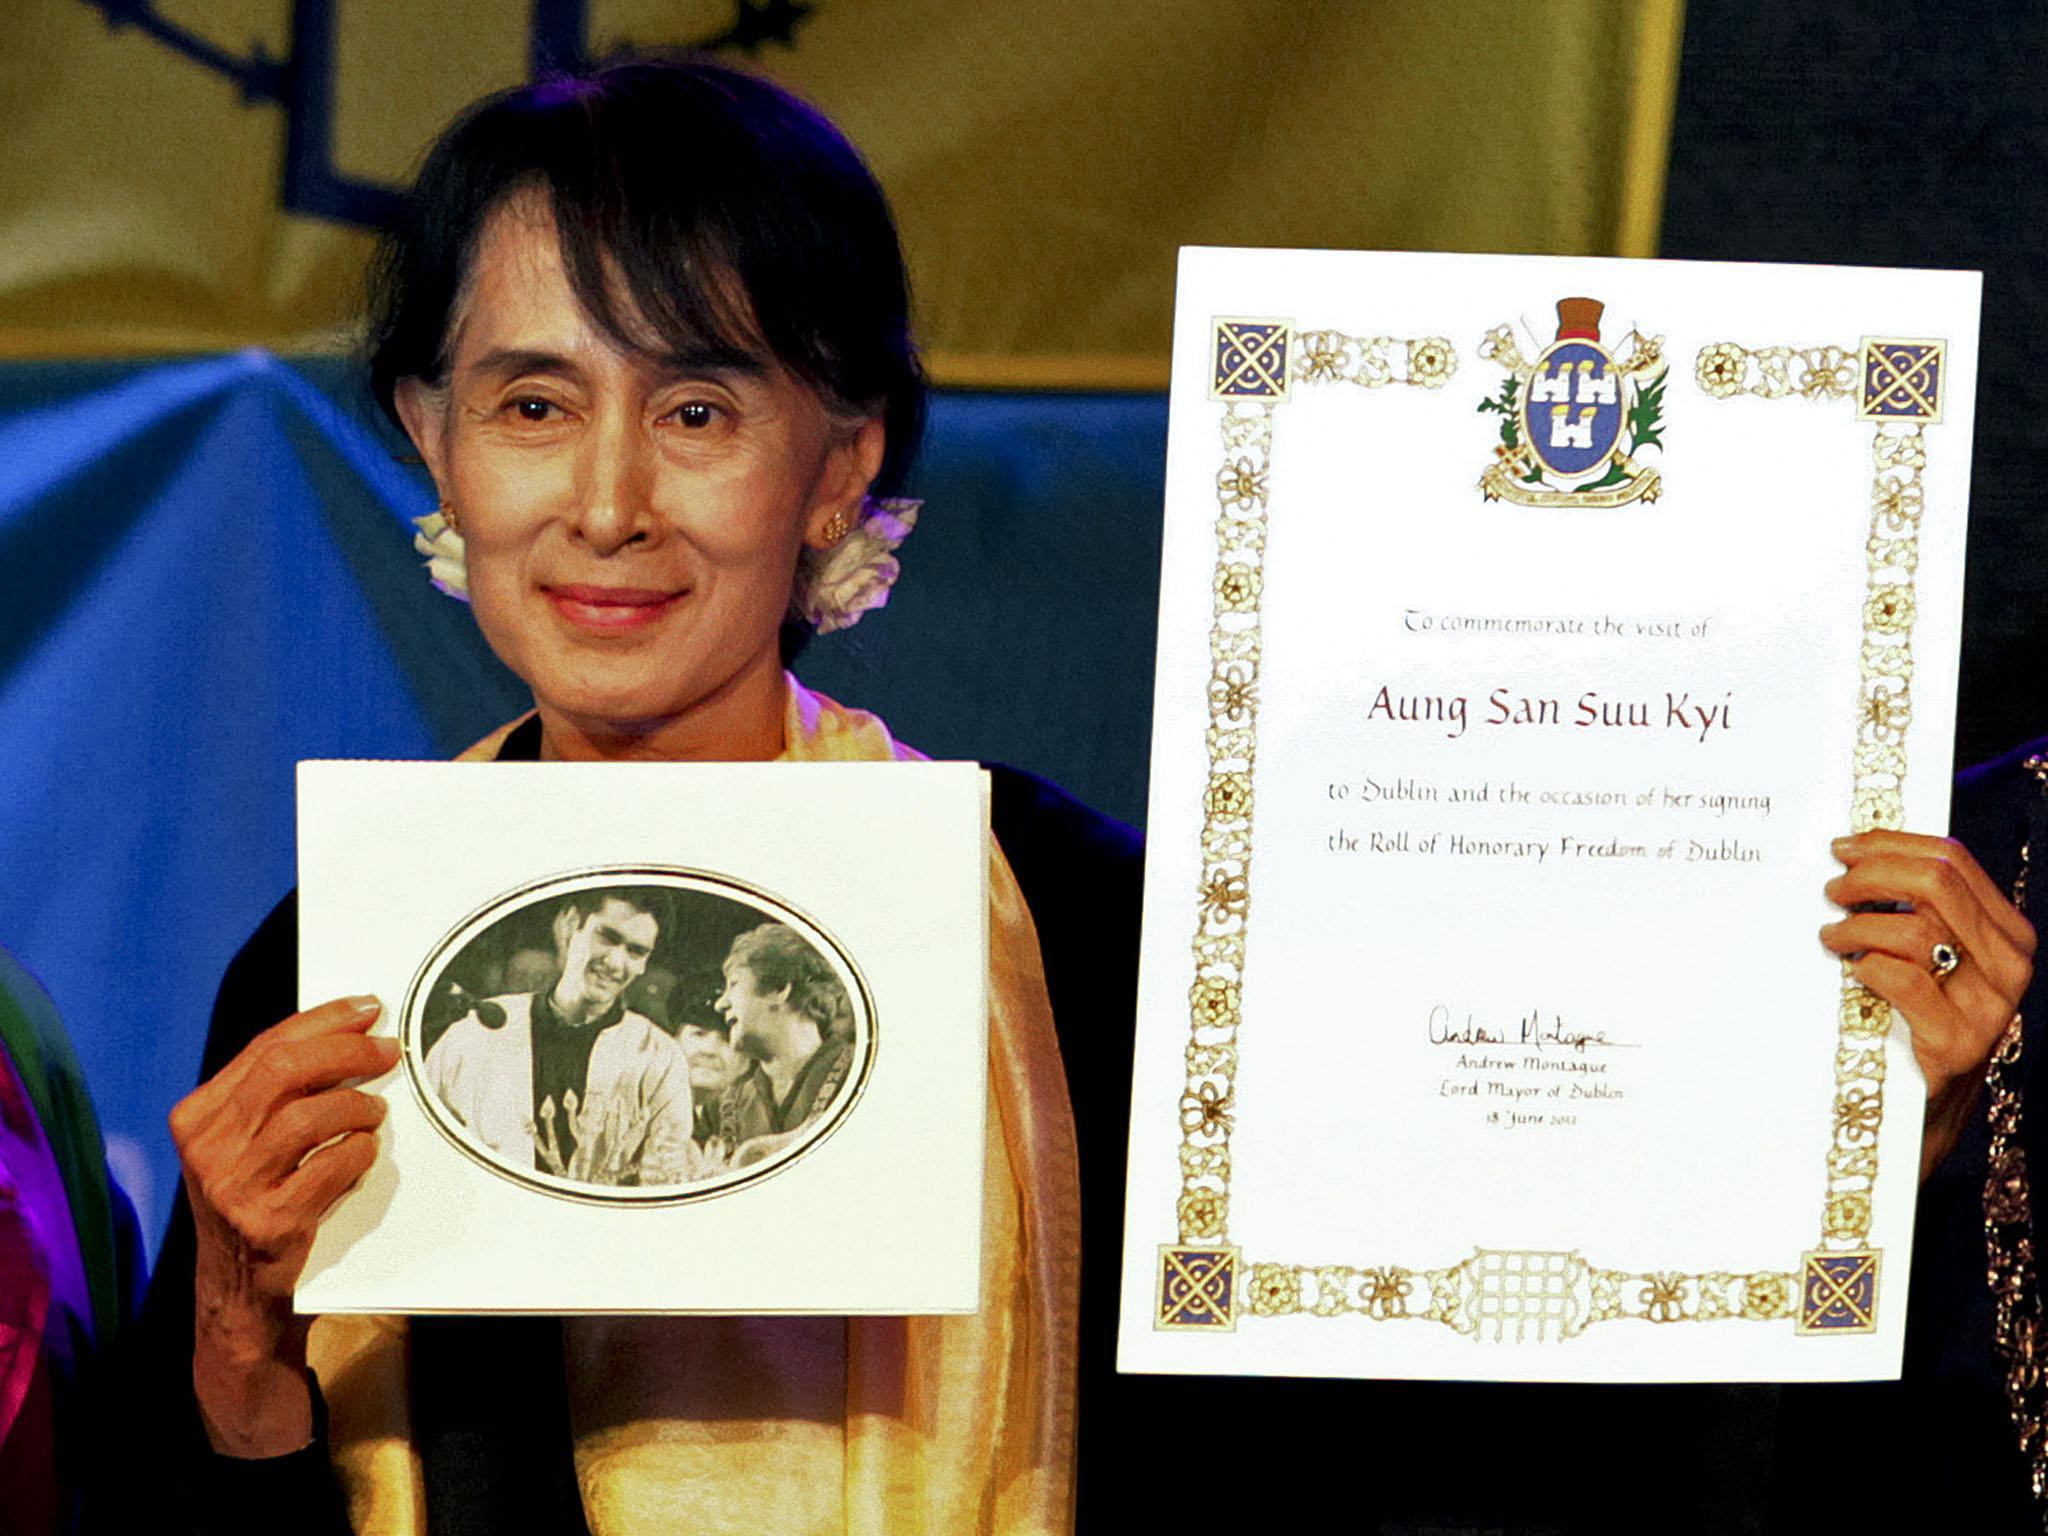 Aung San Suu Kyi stripped of the Freedom of Dublin as Burma's Rohingya crisis deepens